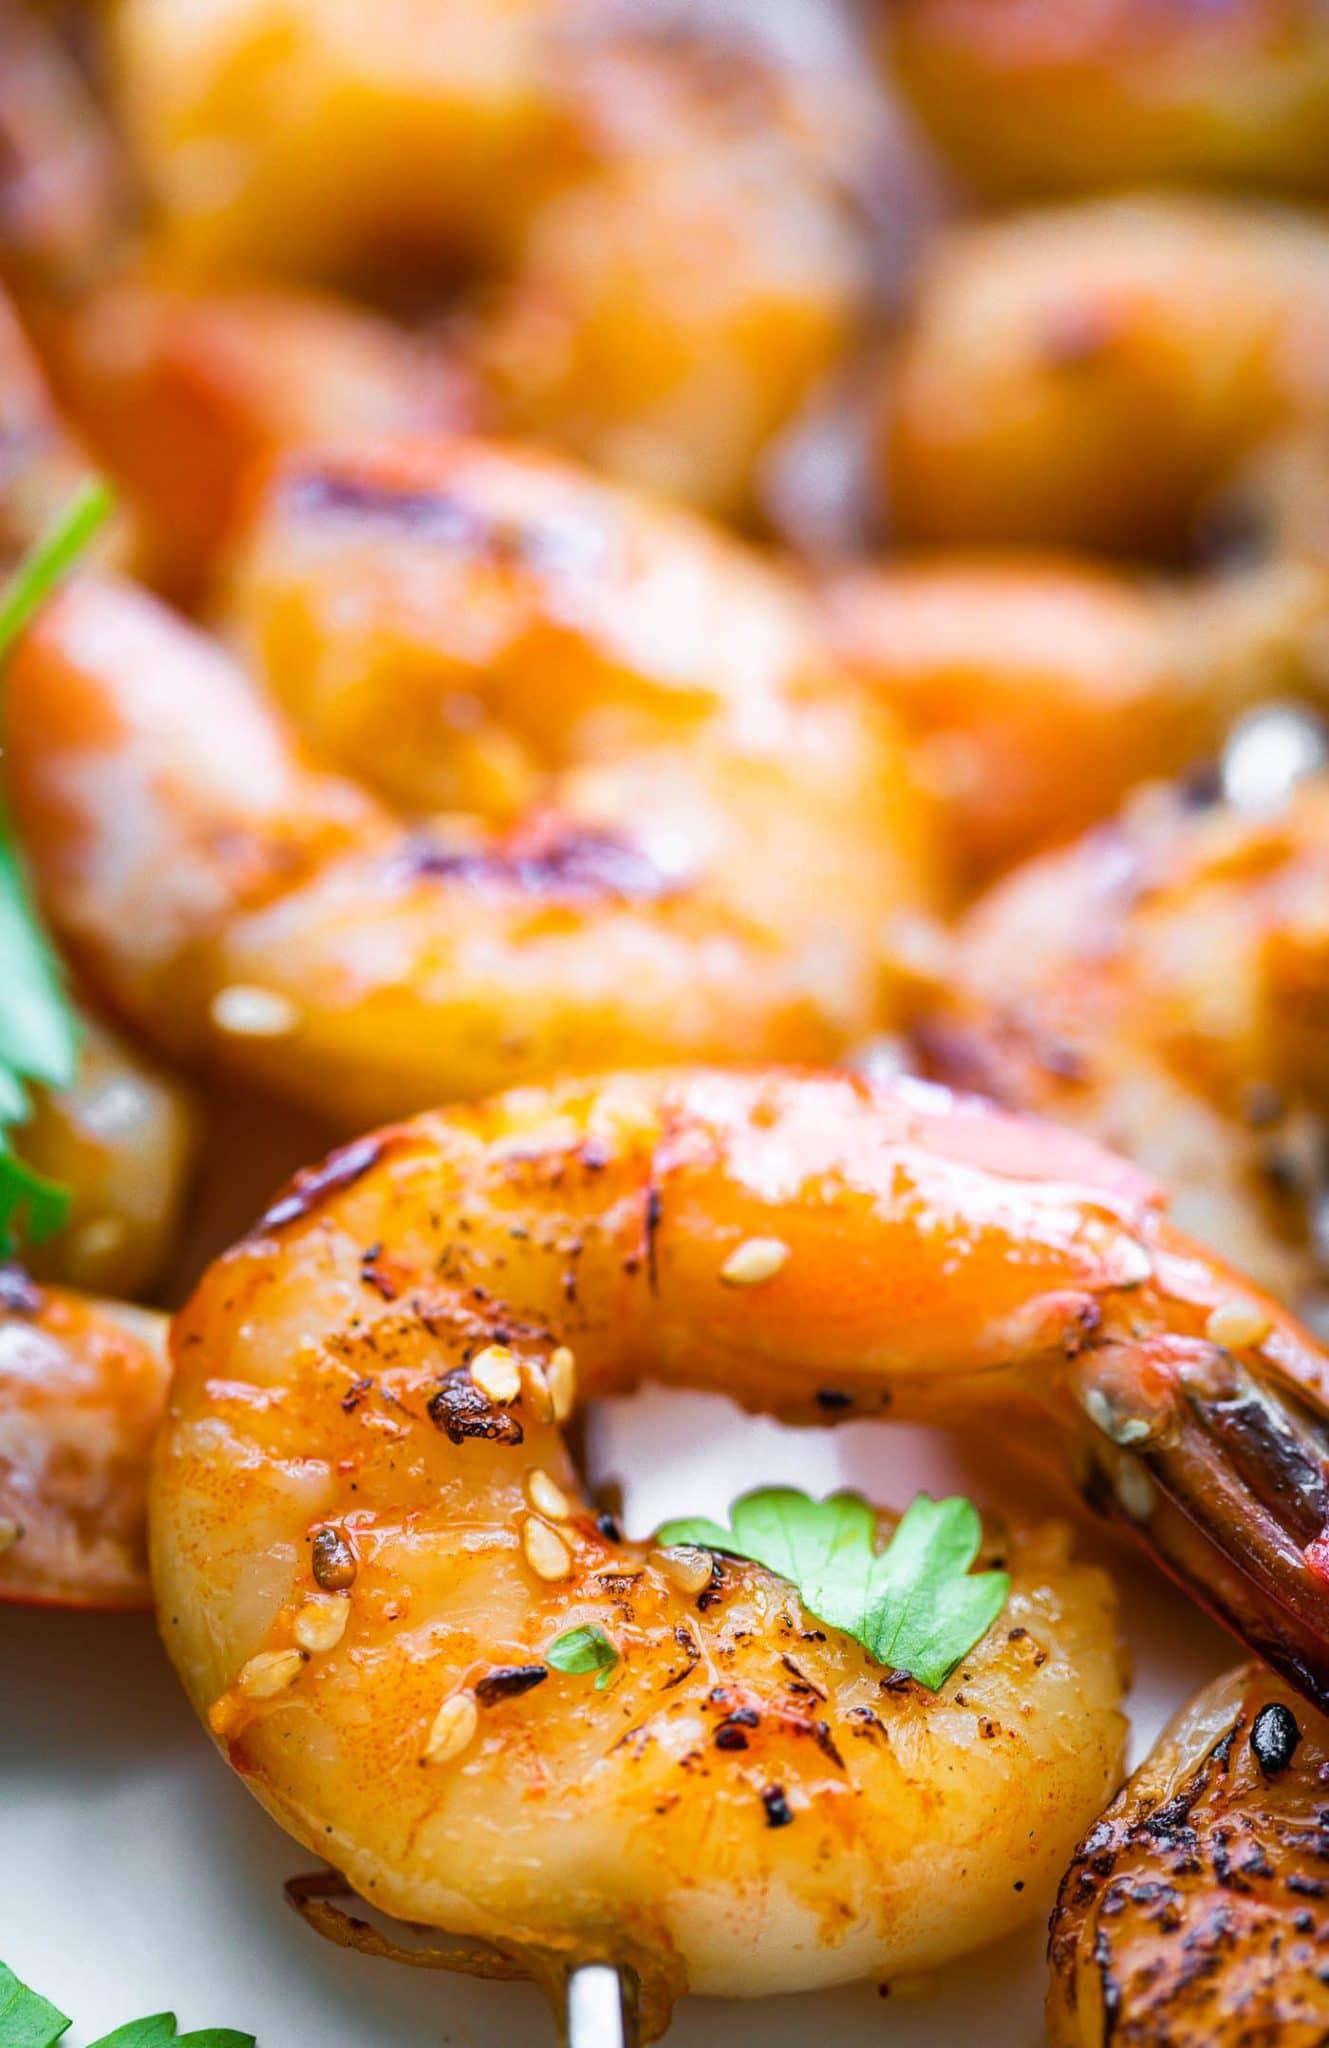 Close up image of marinated grilled shrimp.